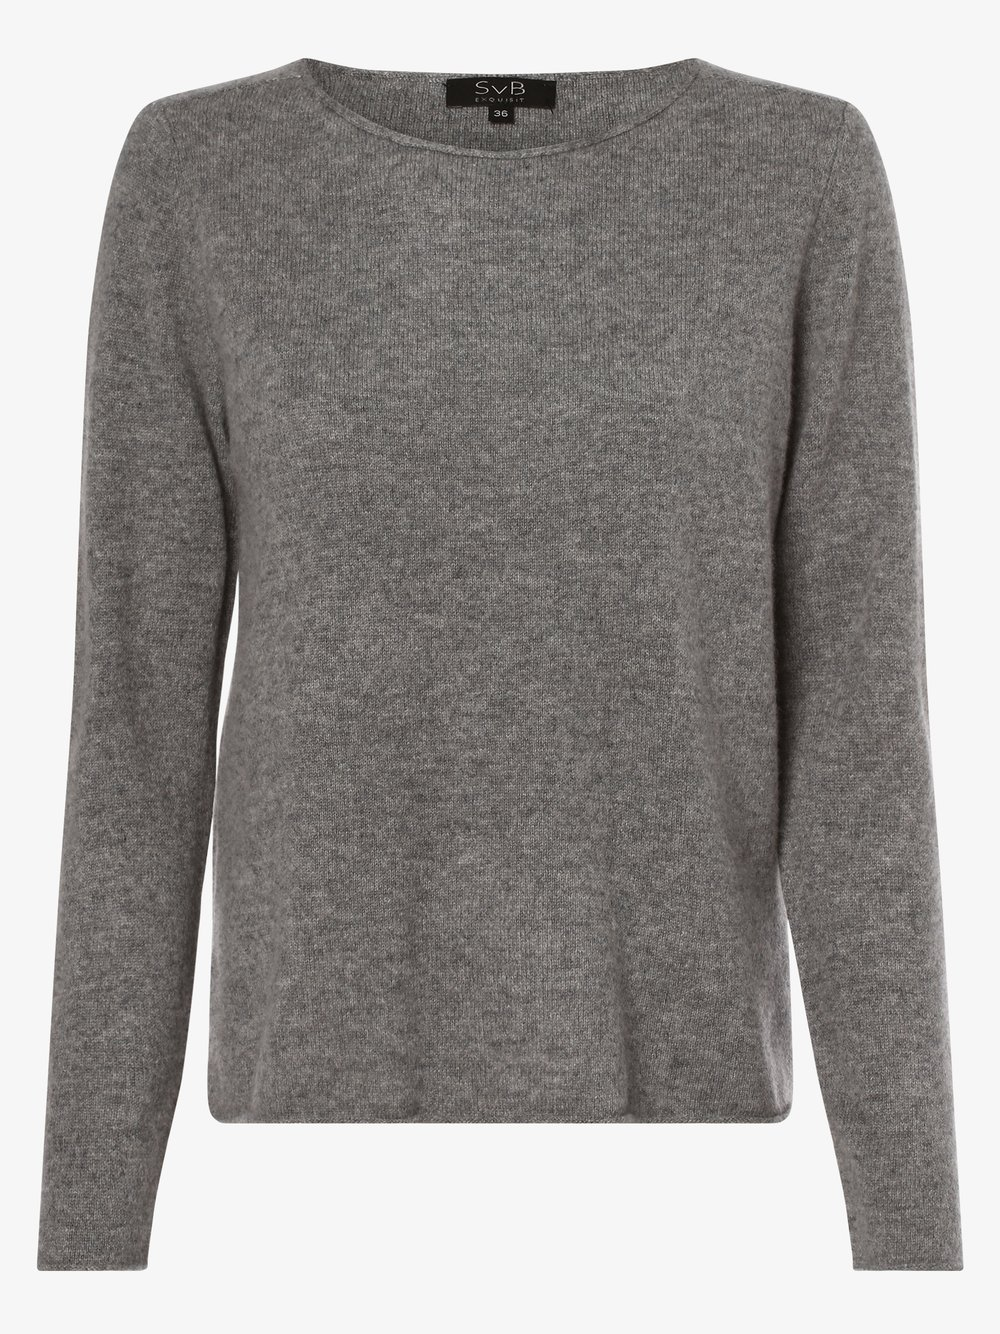 SvB Exquisit – Sweter damski z czystego kaszmiru, szary Van Graaf 479051-0002